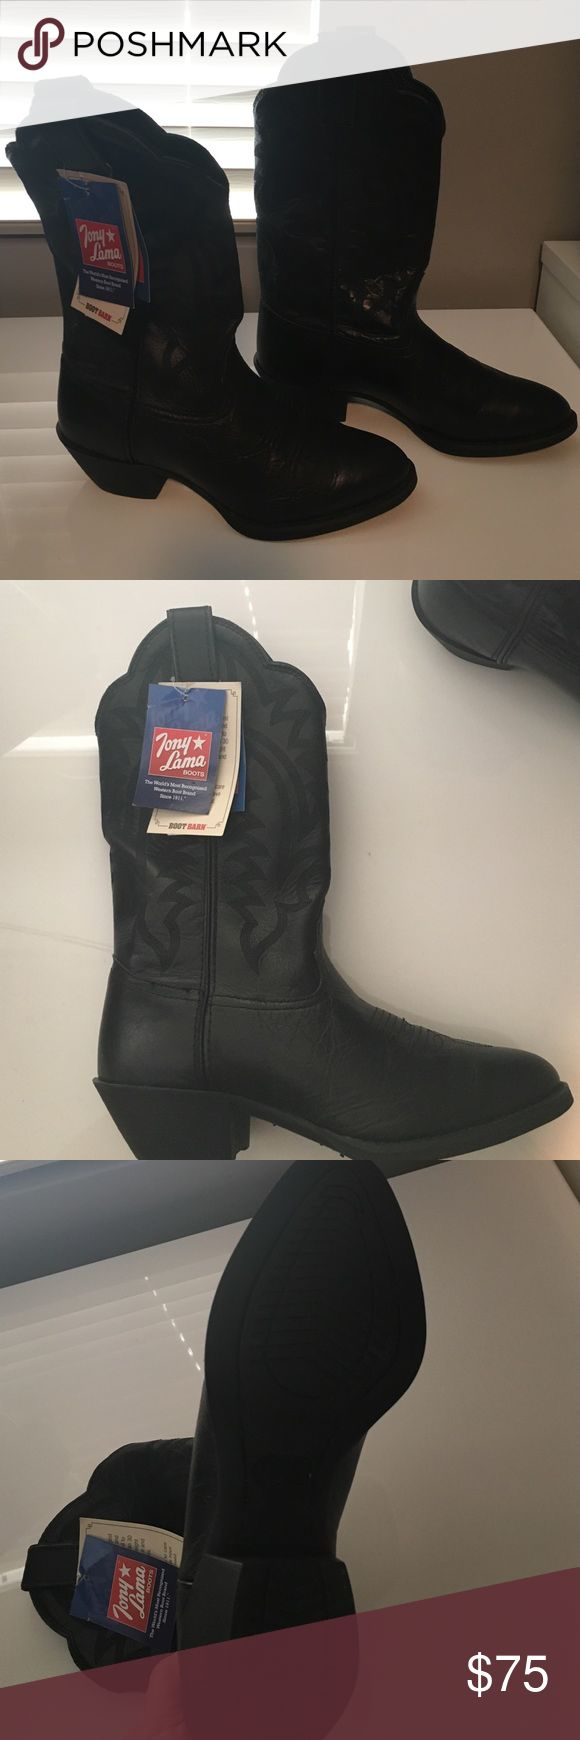 Tony Lama Women's Cowboy Boots - Size 7 Brand new, never worn, real leather cowboy boots. Tony Lama Shoes Heeled Boots